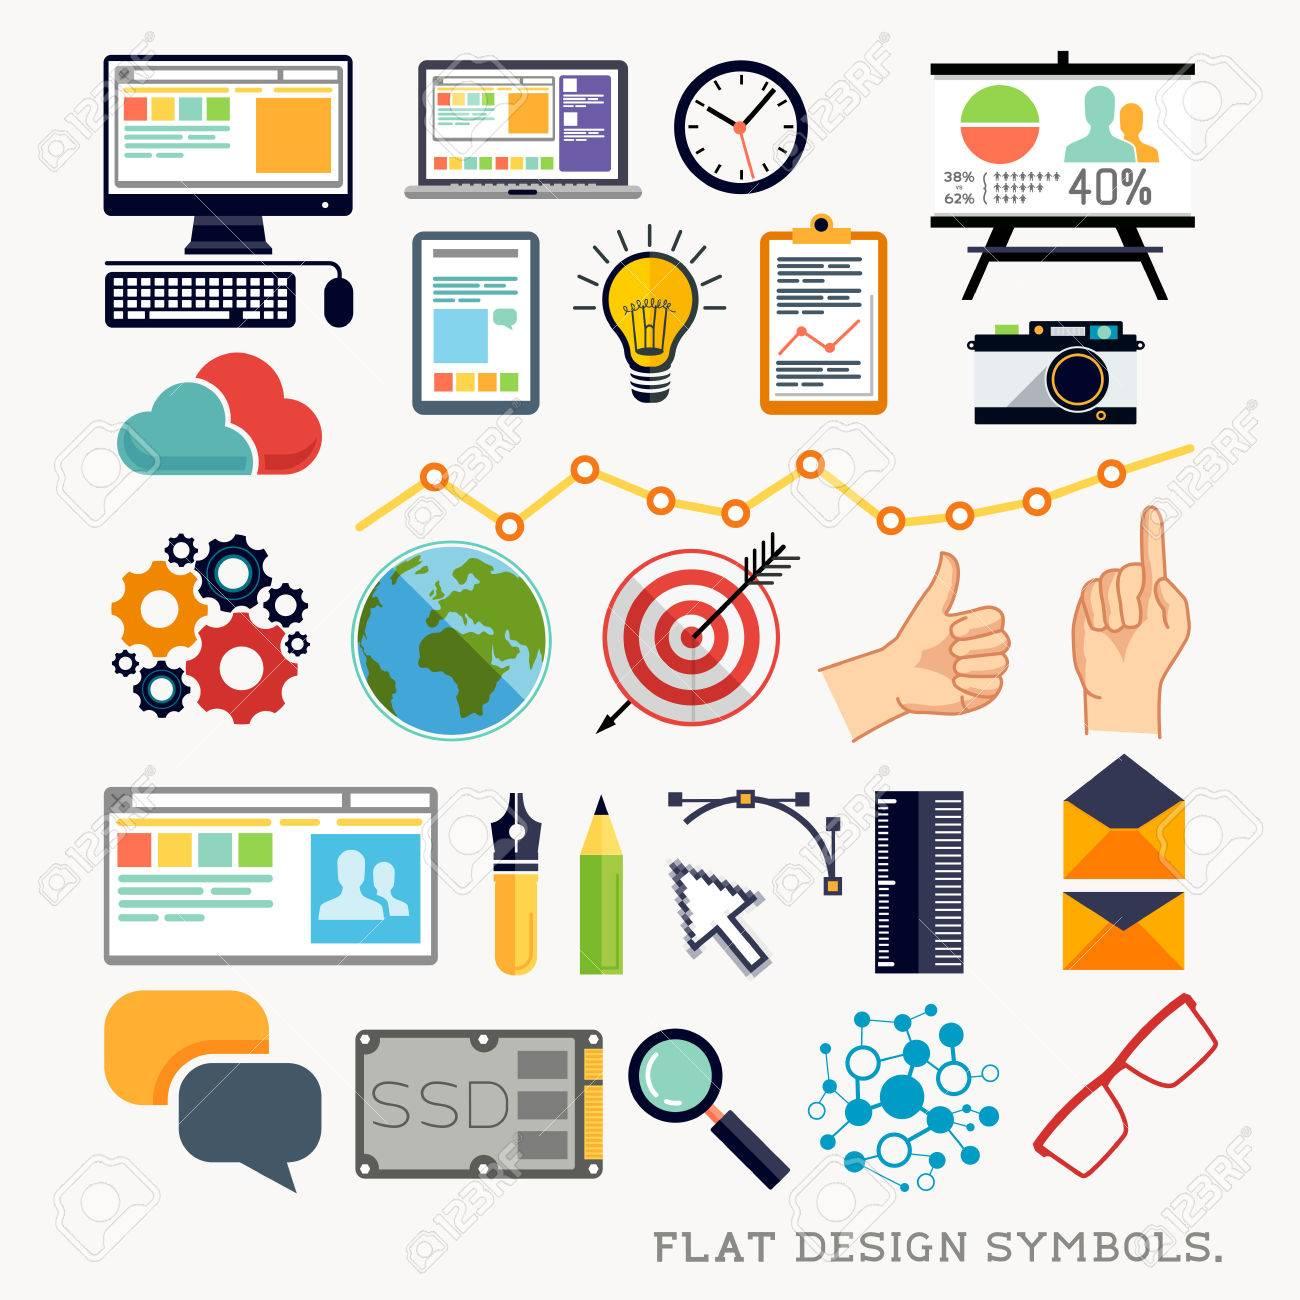 Symbols in business communication